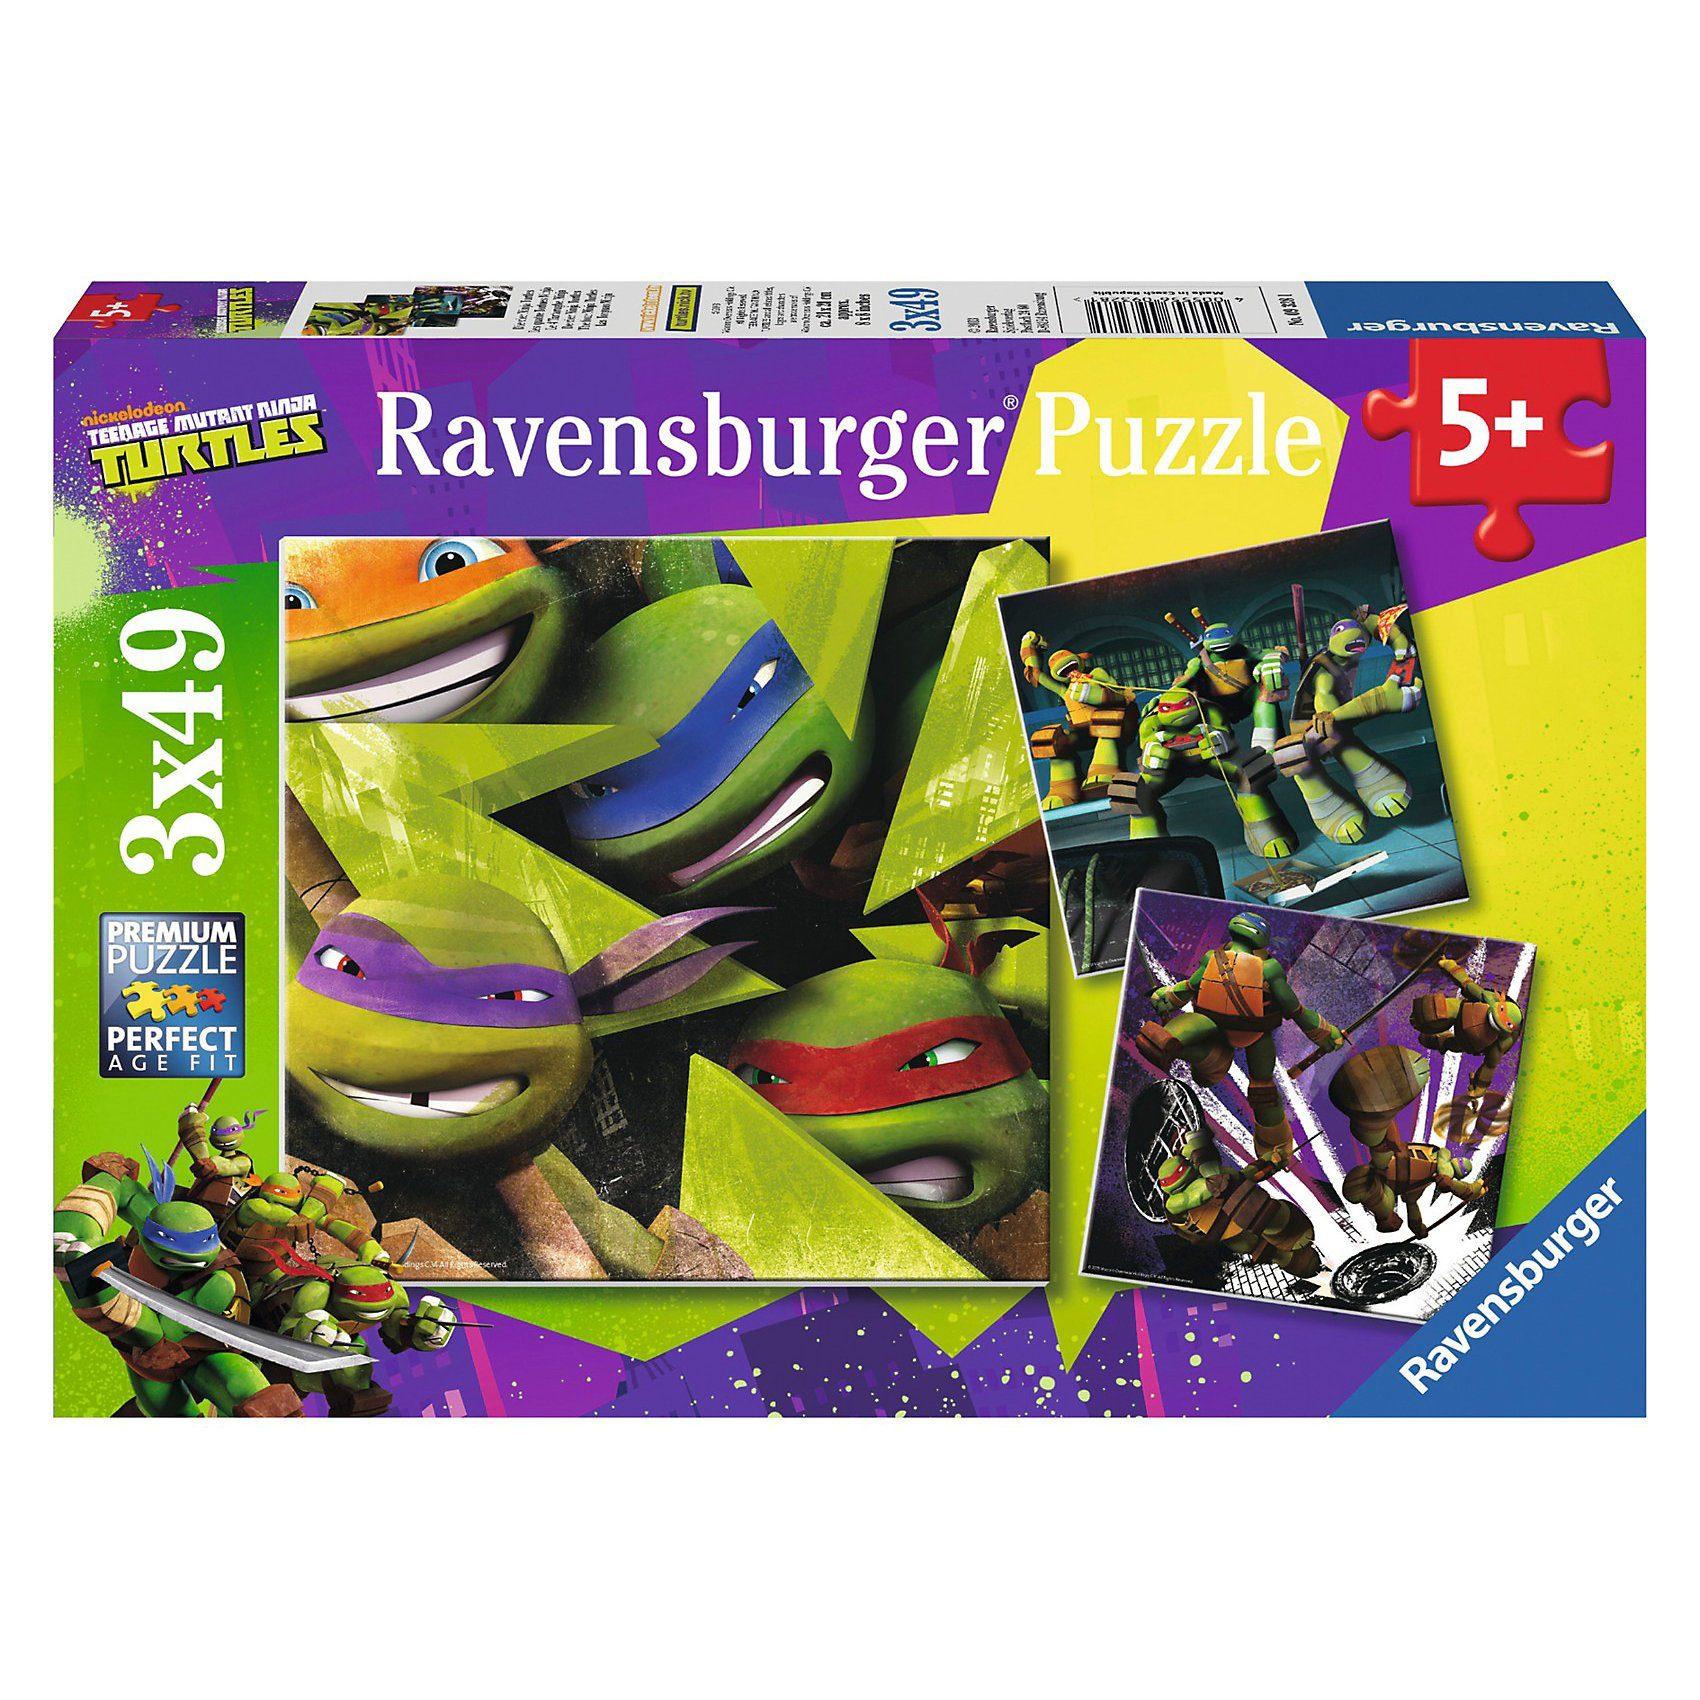 Ravensburger Puzzleset Die vier Ninja Turtles 3 x 49 Teile